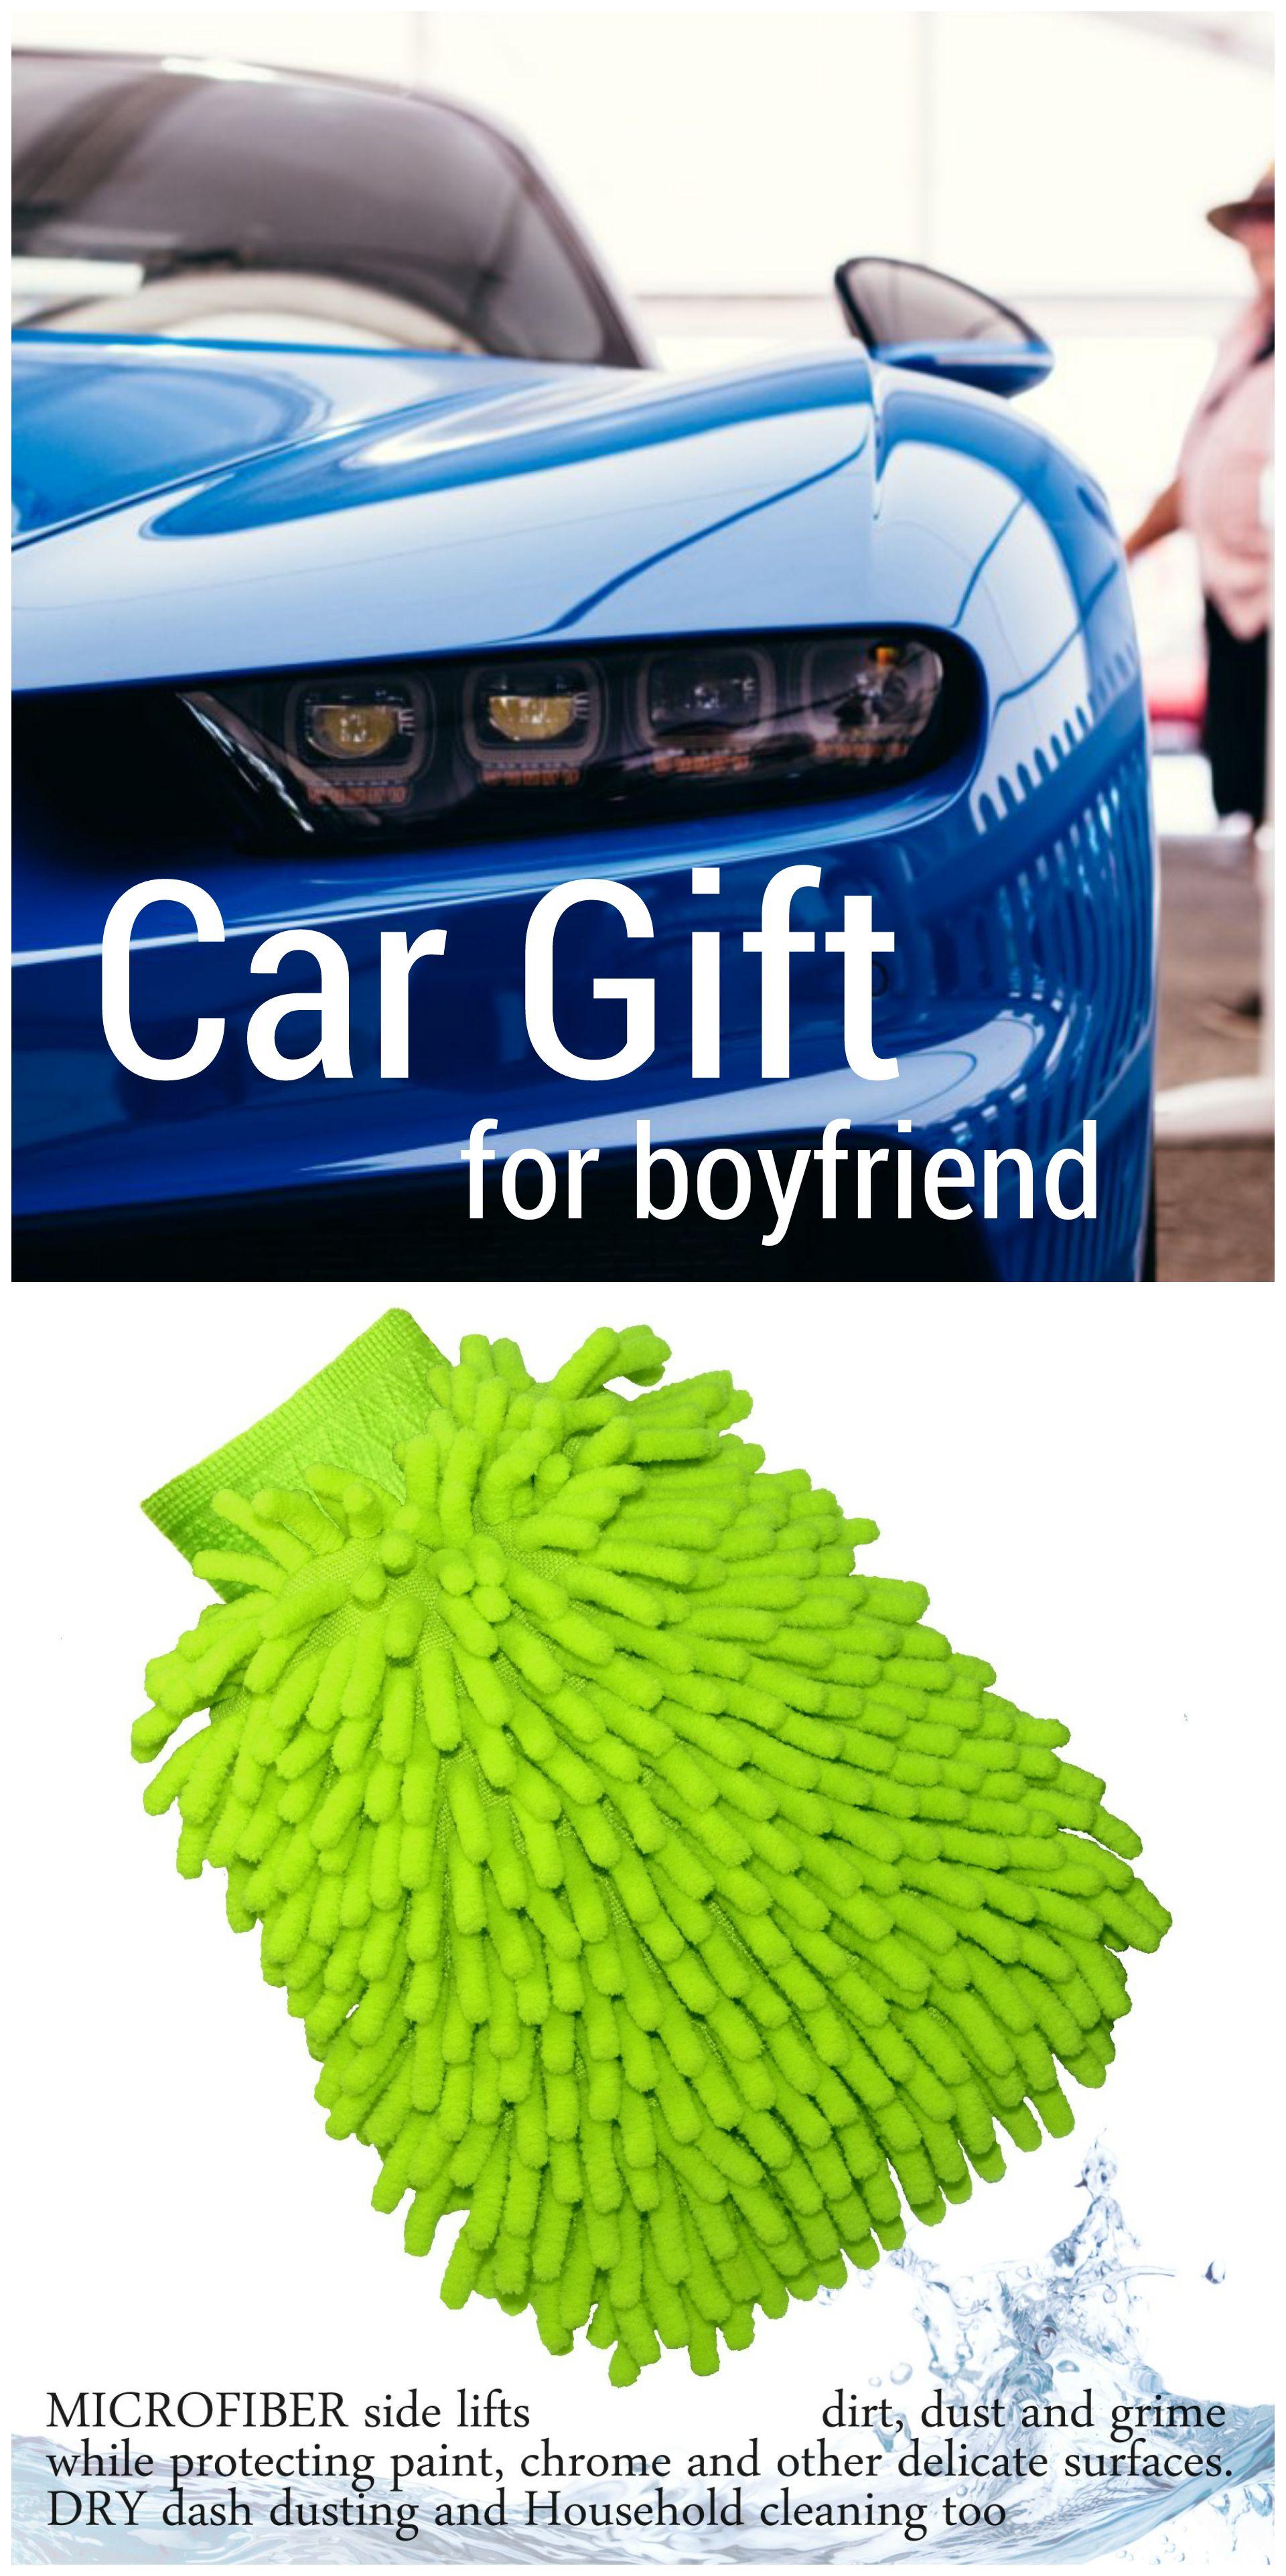 Car Care Cleaning Microfiber Car Wash Mitt Car Cleaning Exterior Vehicle Car Washing Car Cleaning Exterior Microfiber Car Care Cleaning Car Wash Equipment